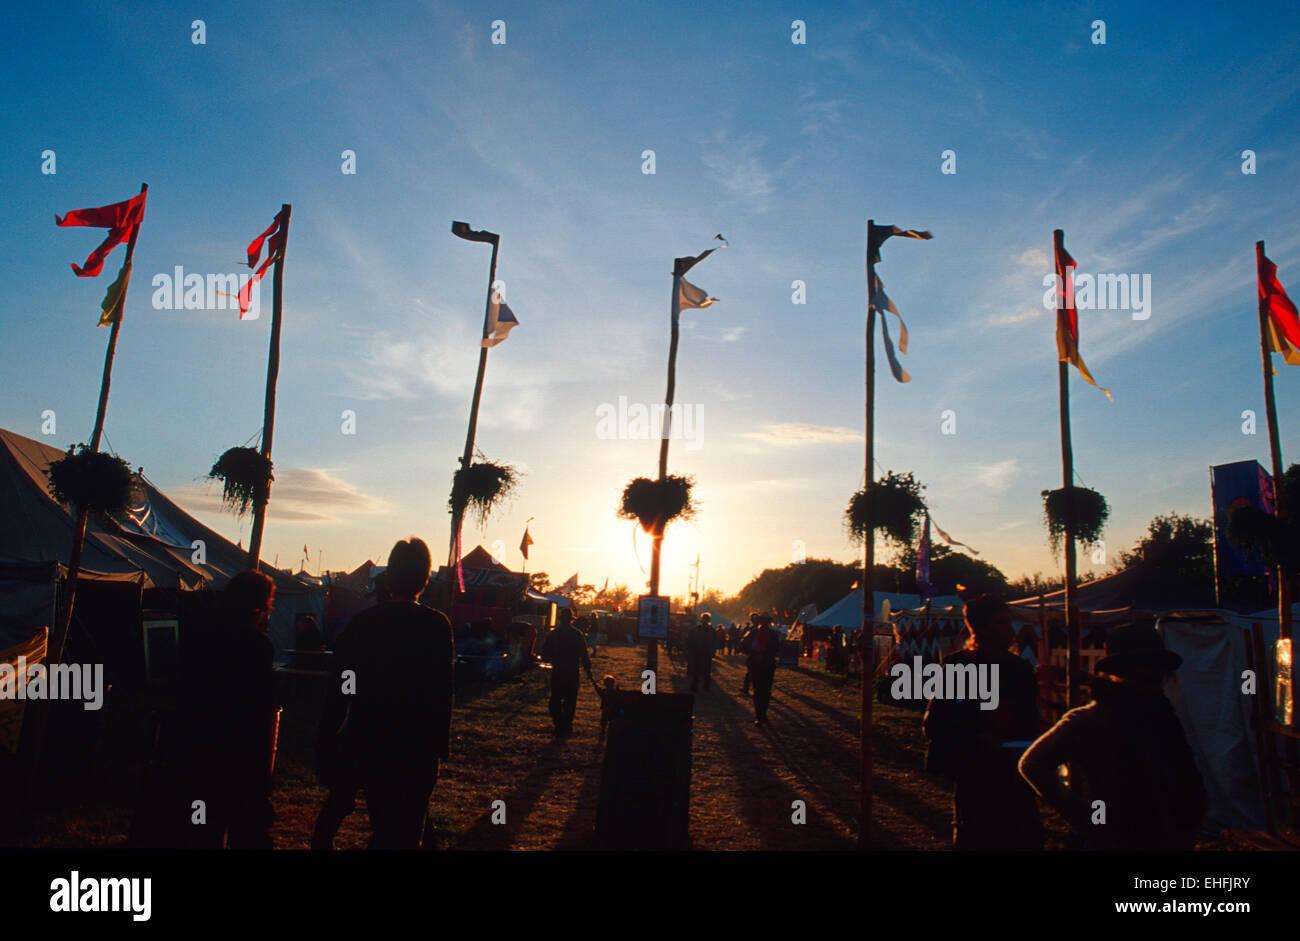 Sundown at the Glastonbury festival. - Stock Image